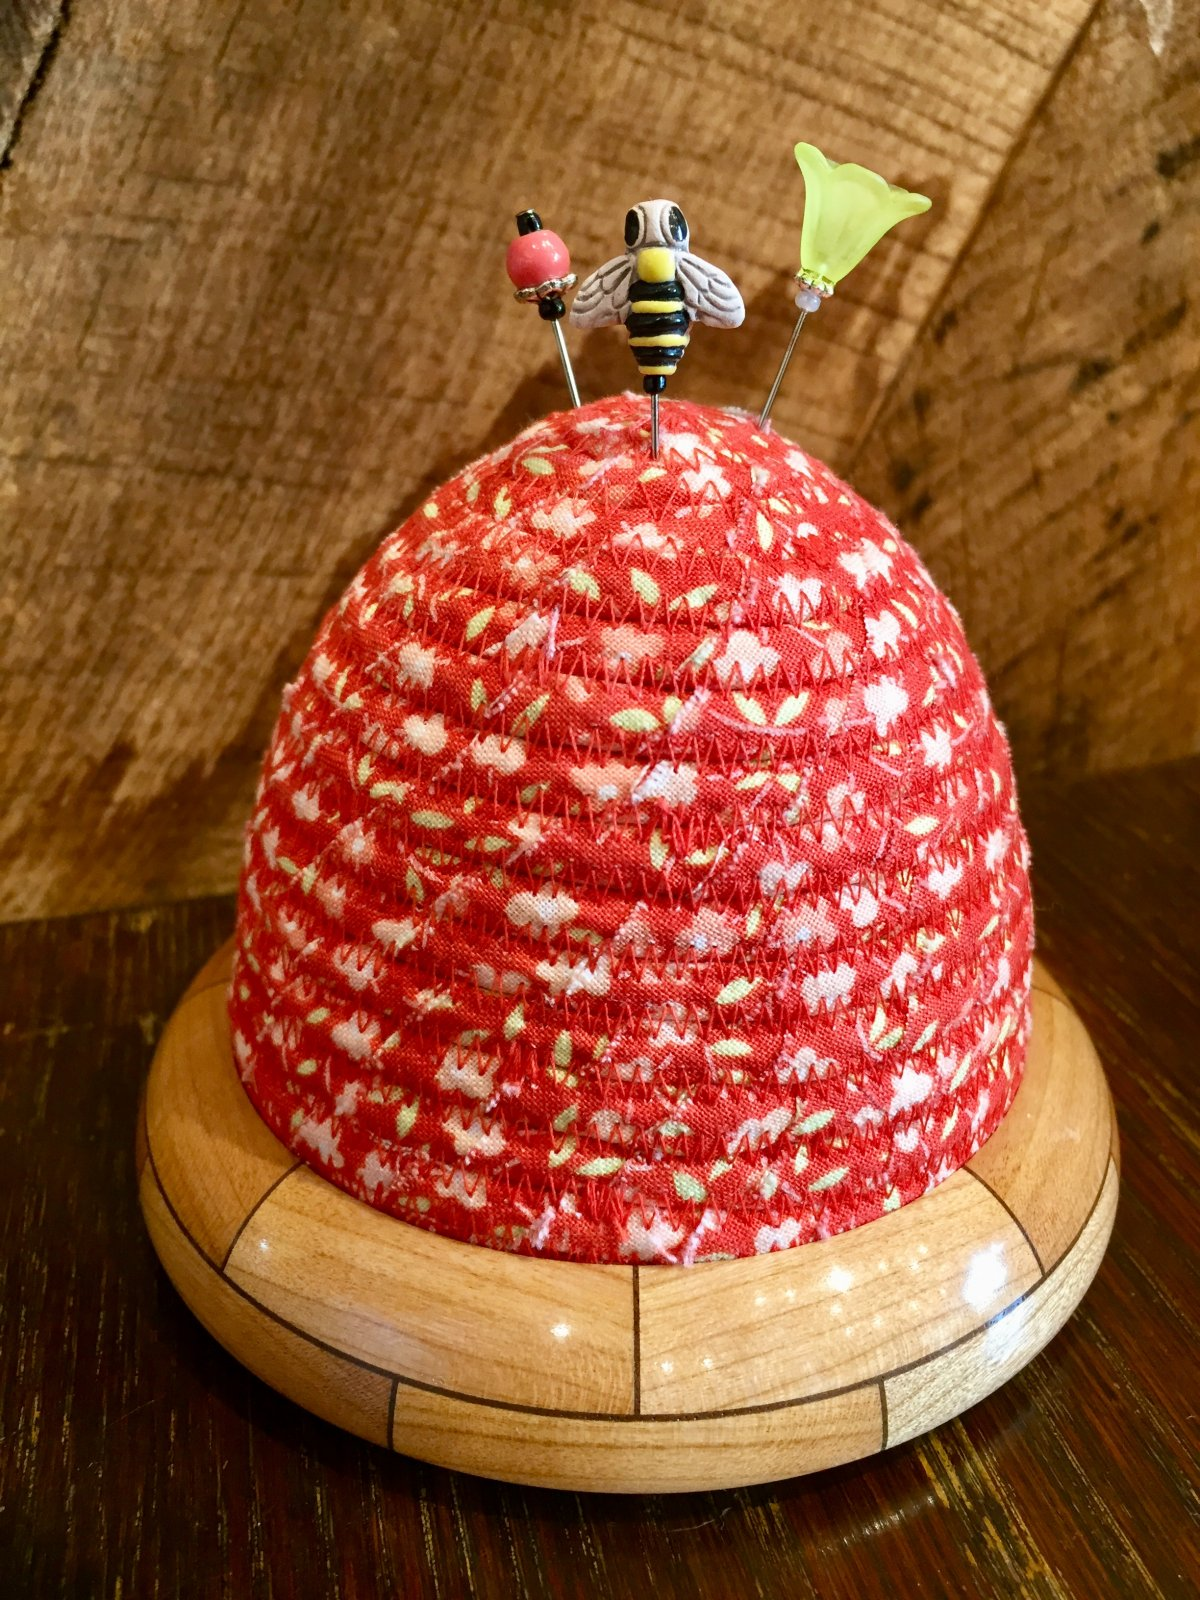 Beehive Pincushion - Fig Tree Strawberries & Rhubarb Meadow - Strawberry Top - Cherry / Walnut Base